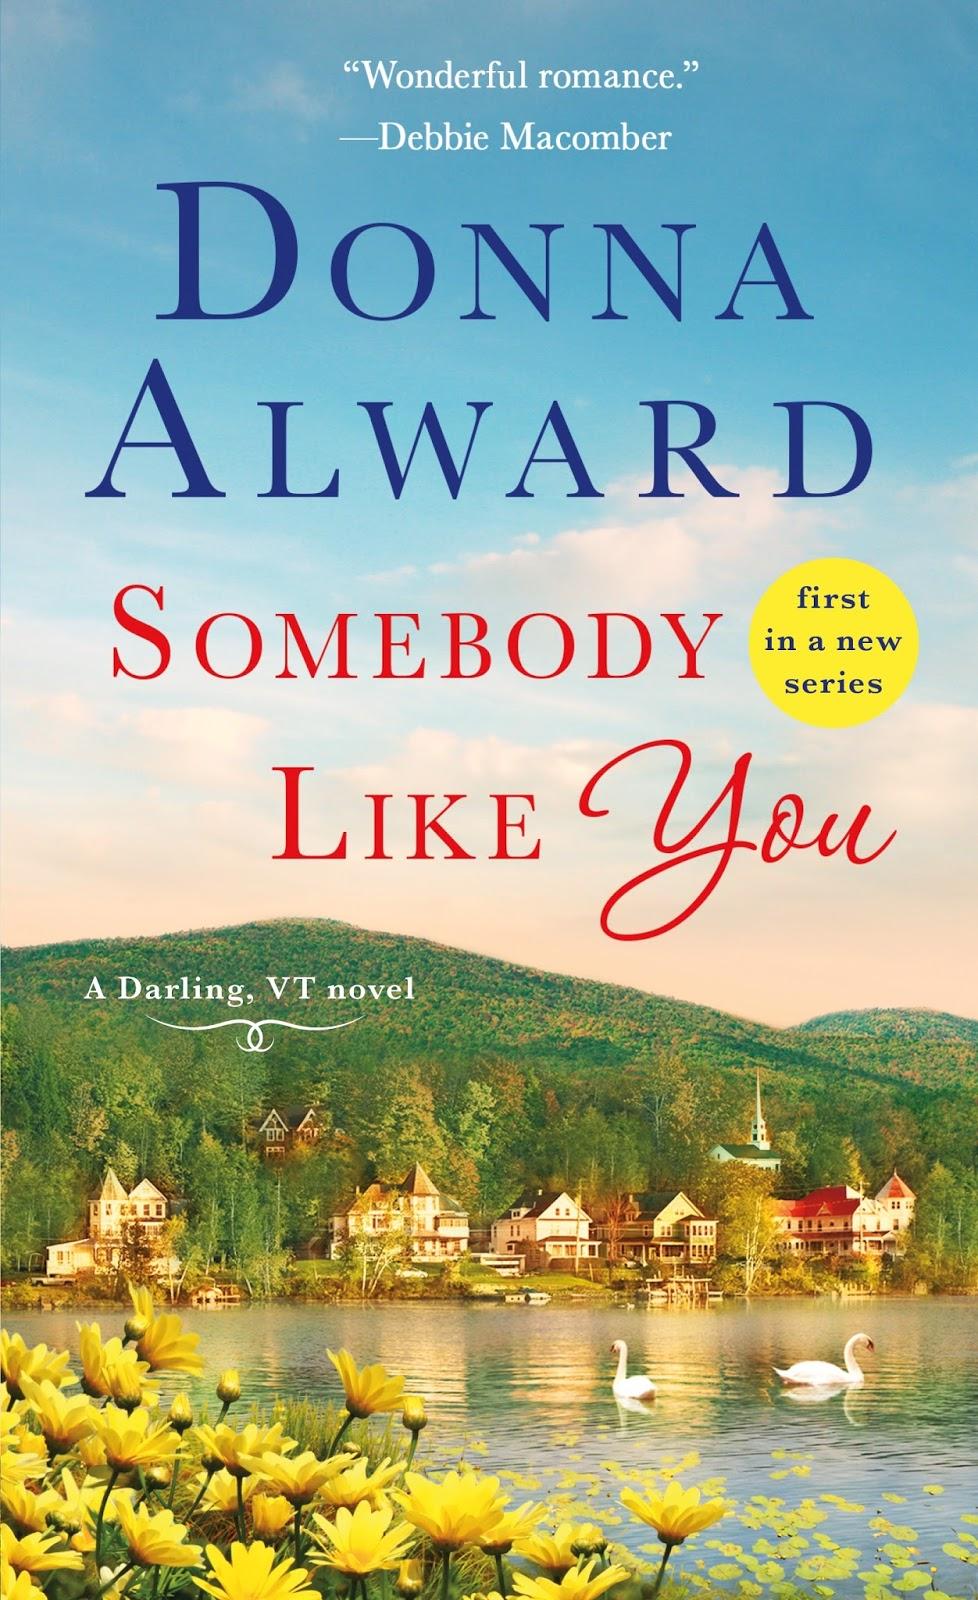 Somebody Like You by Donna Alward